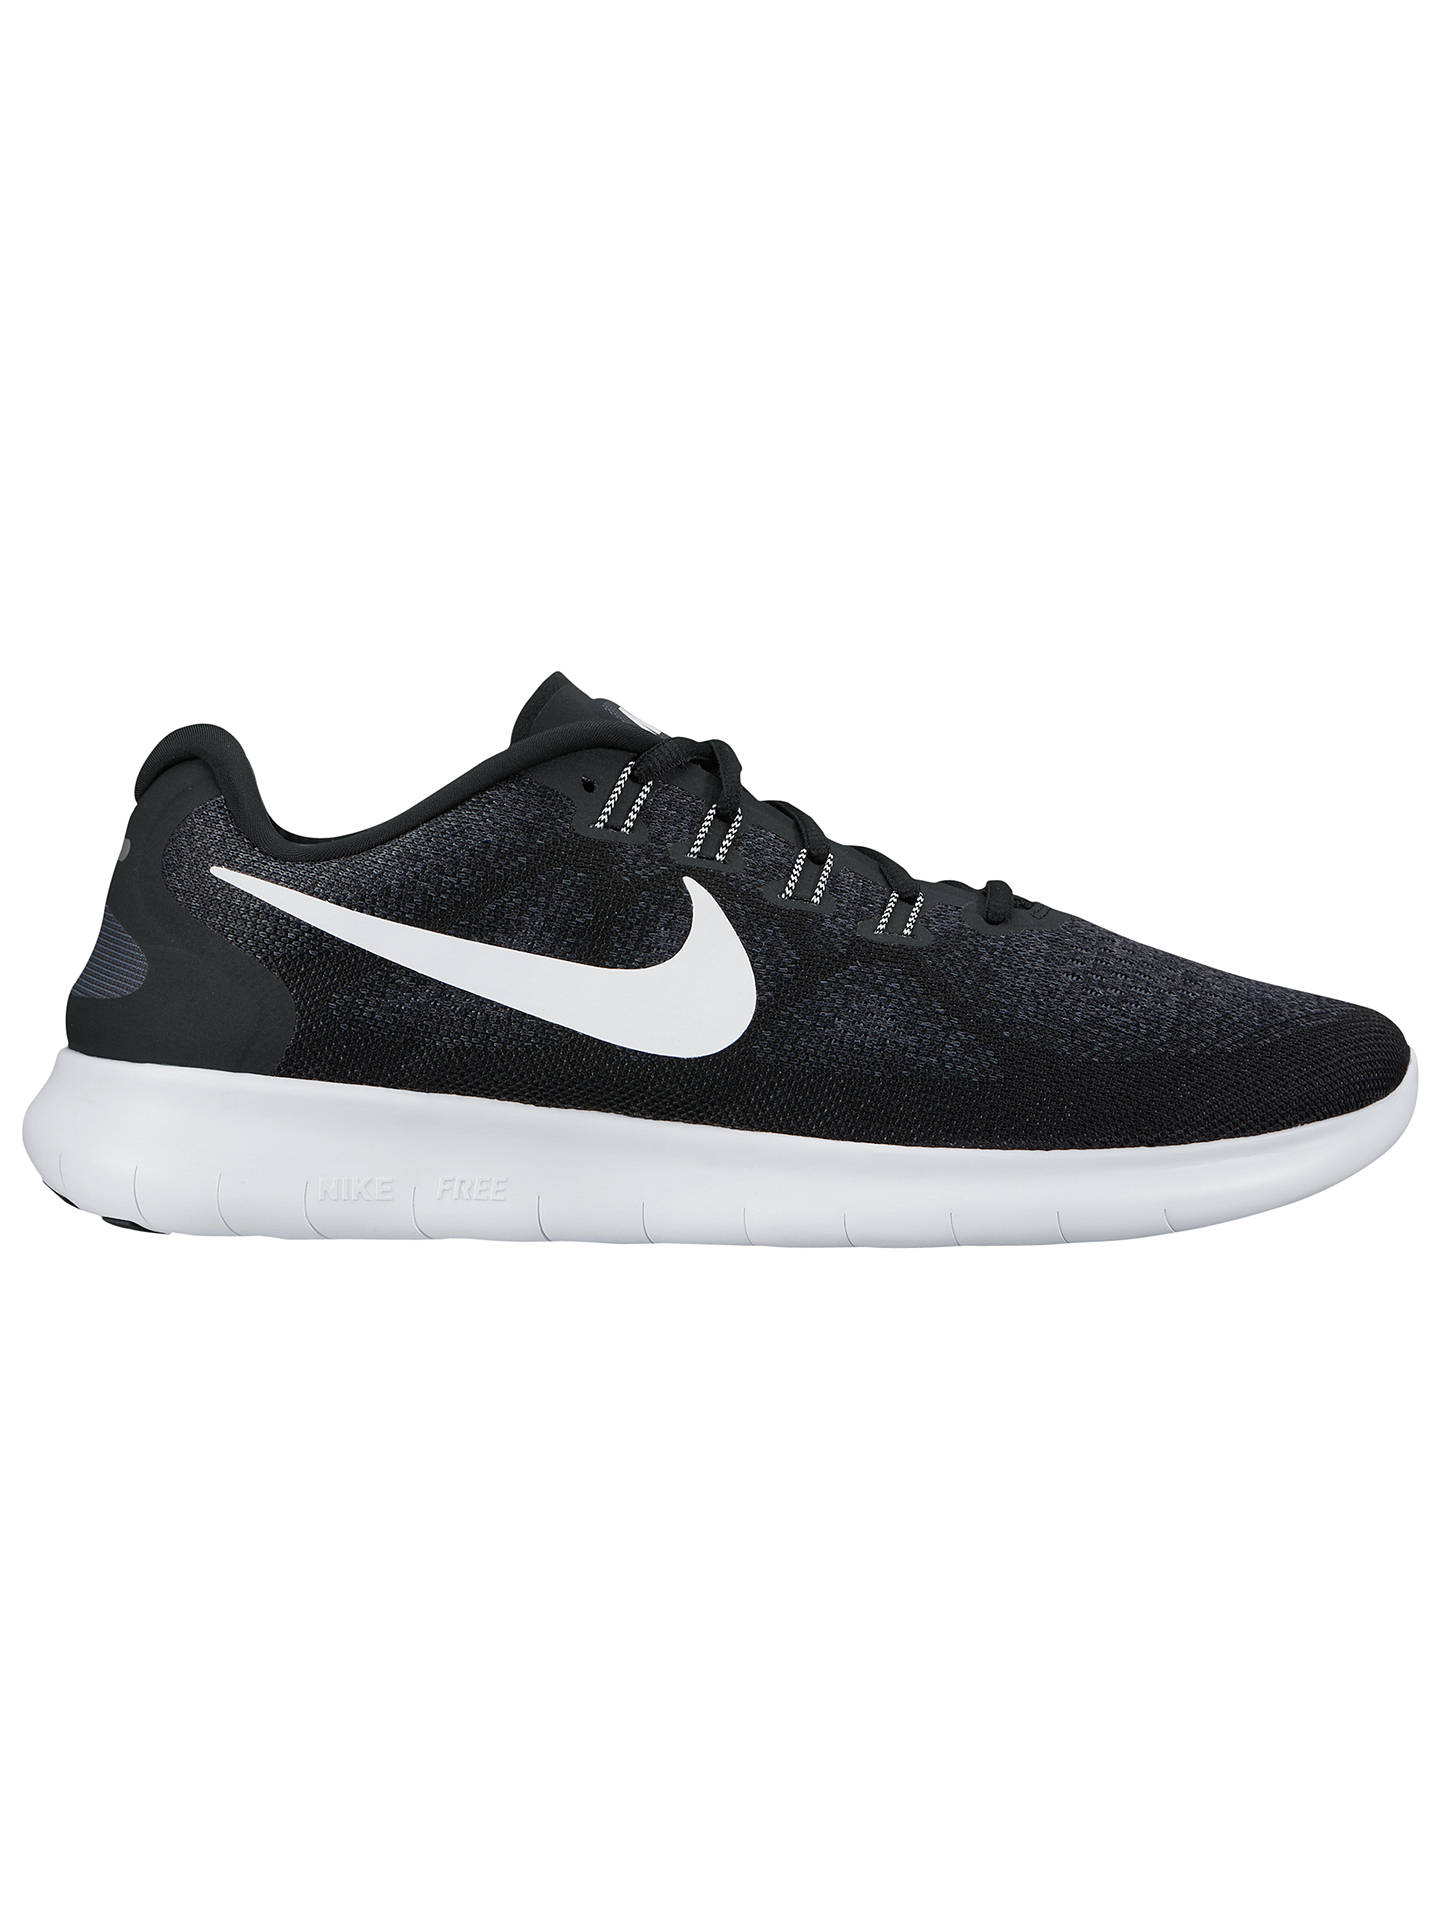 2d4d3b0ef574 Buy Nike Free RN 2017 Women s Running Shoes